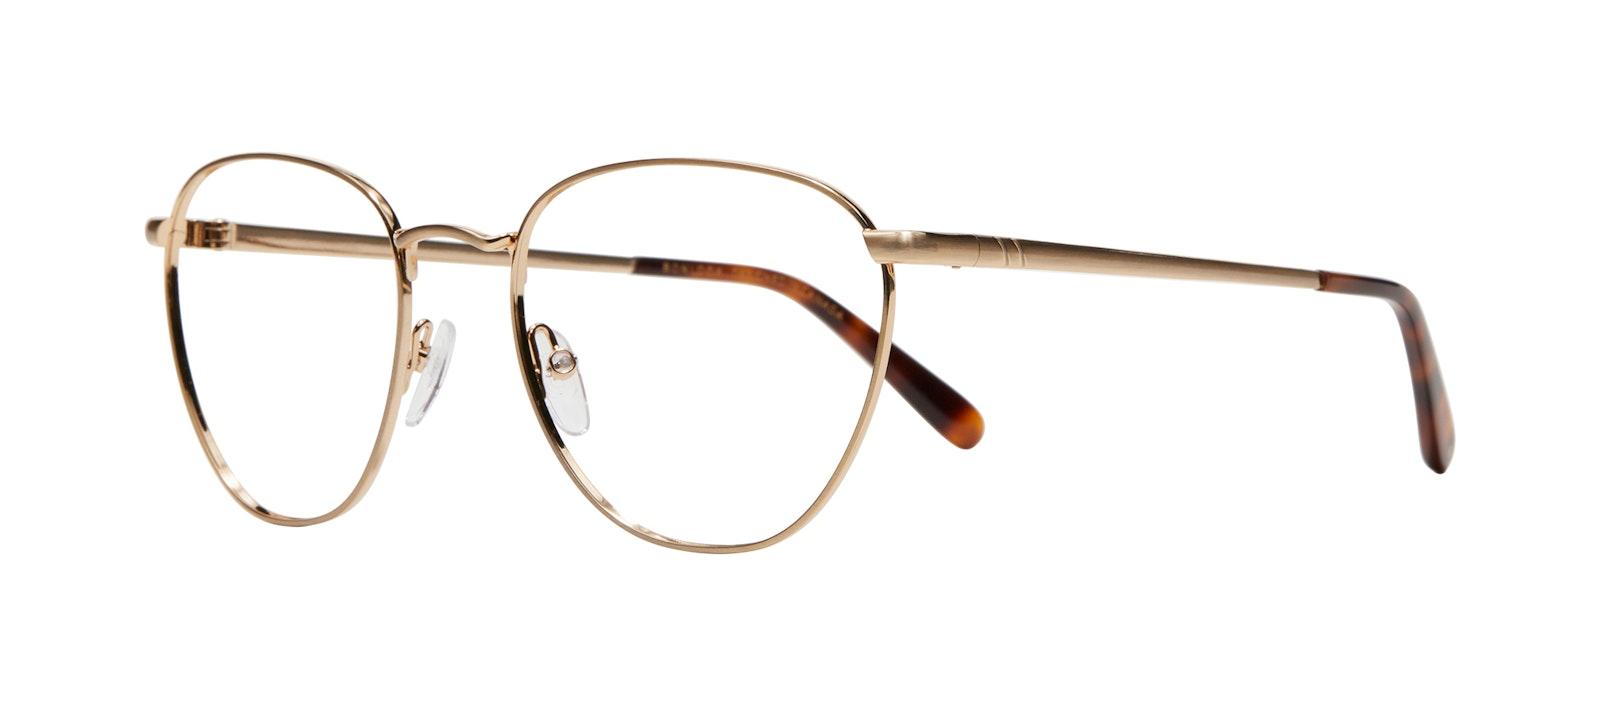 Affordable Fashion Glasses Round Eyeglasses Women Radiant Matte Gold Tilt